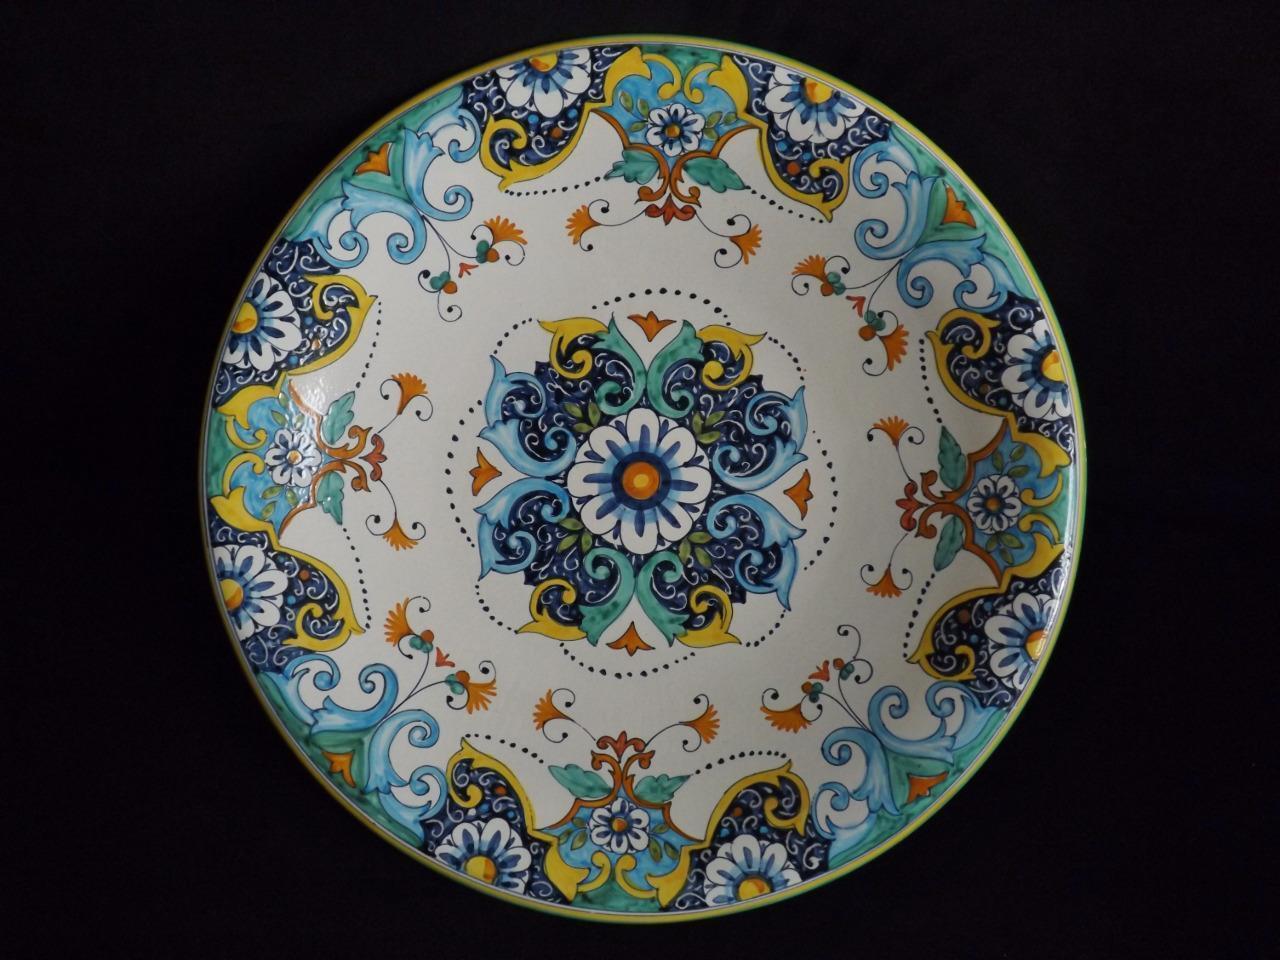 NWT Fravolini Oggetti D Arte 16 He Painted Wtutti Hanging Bowl